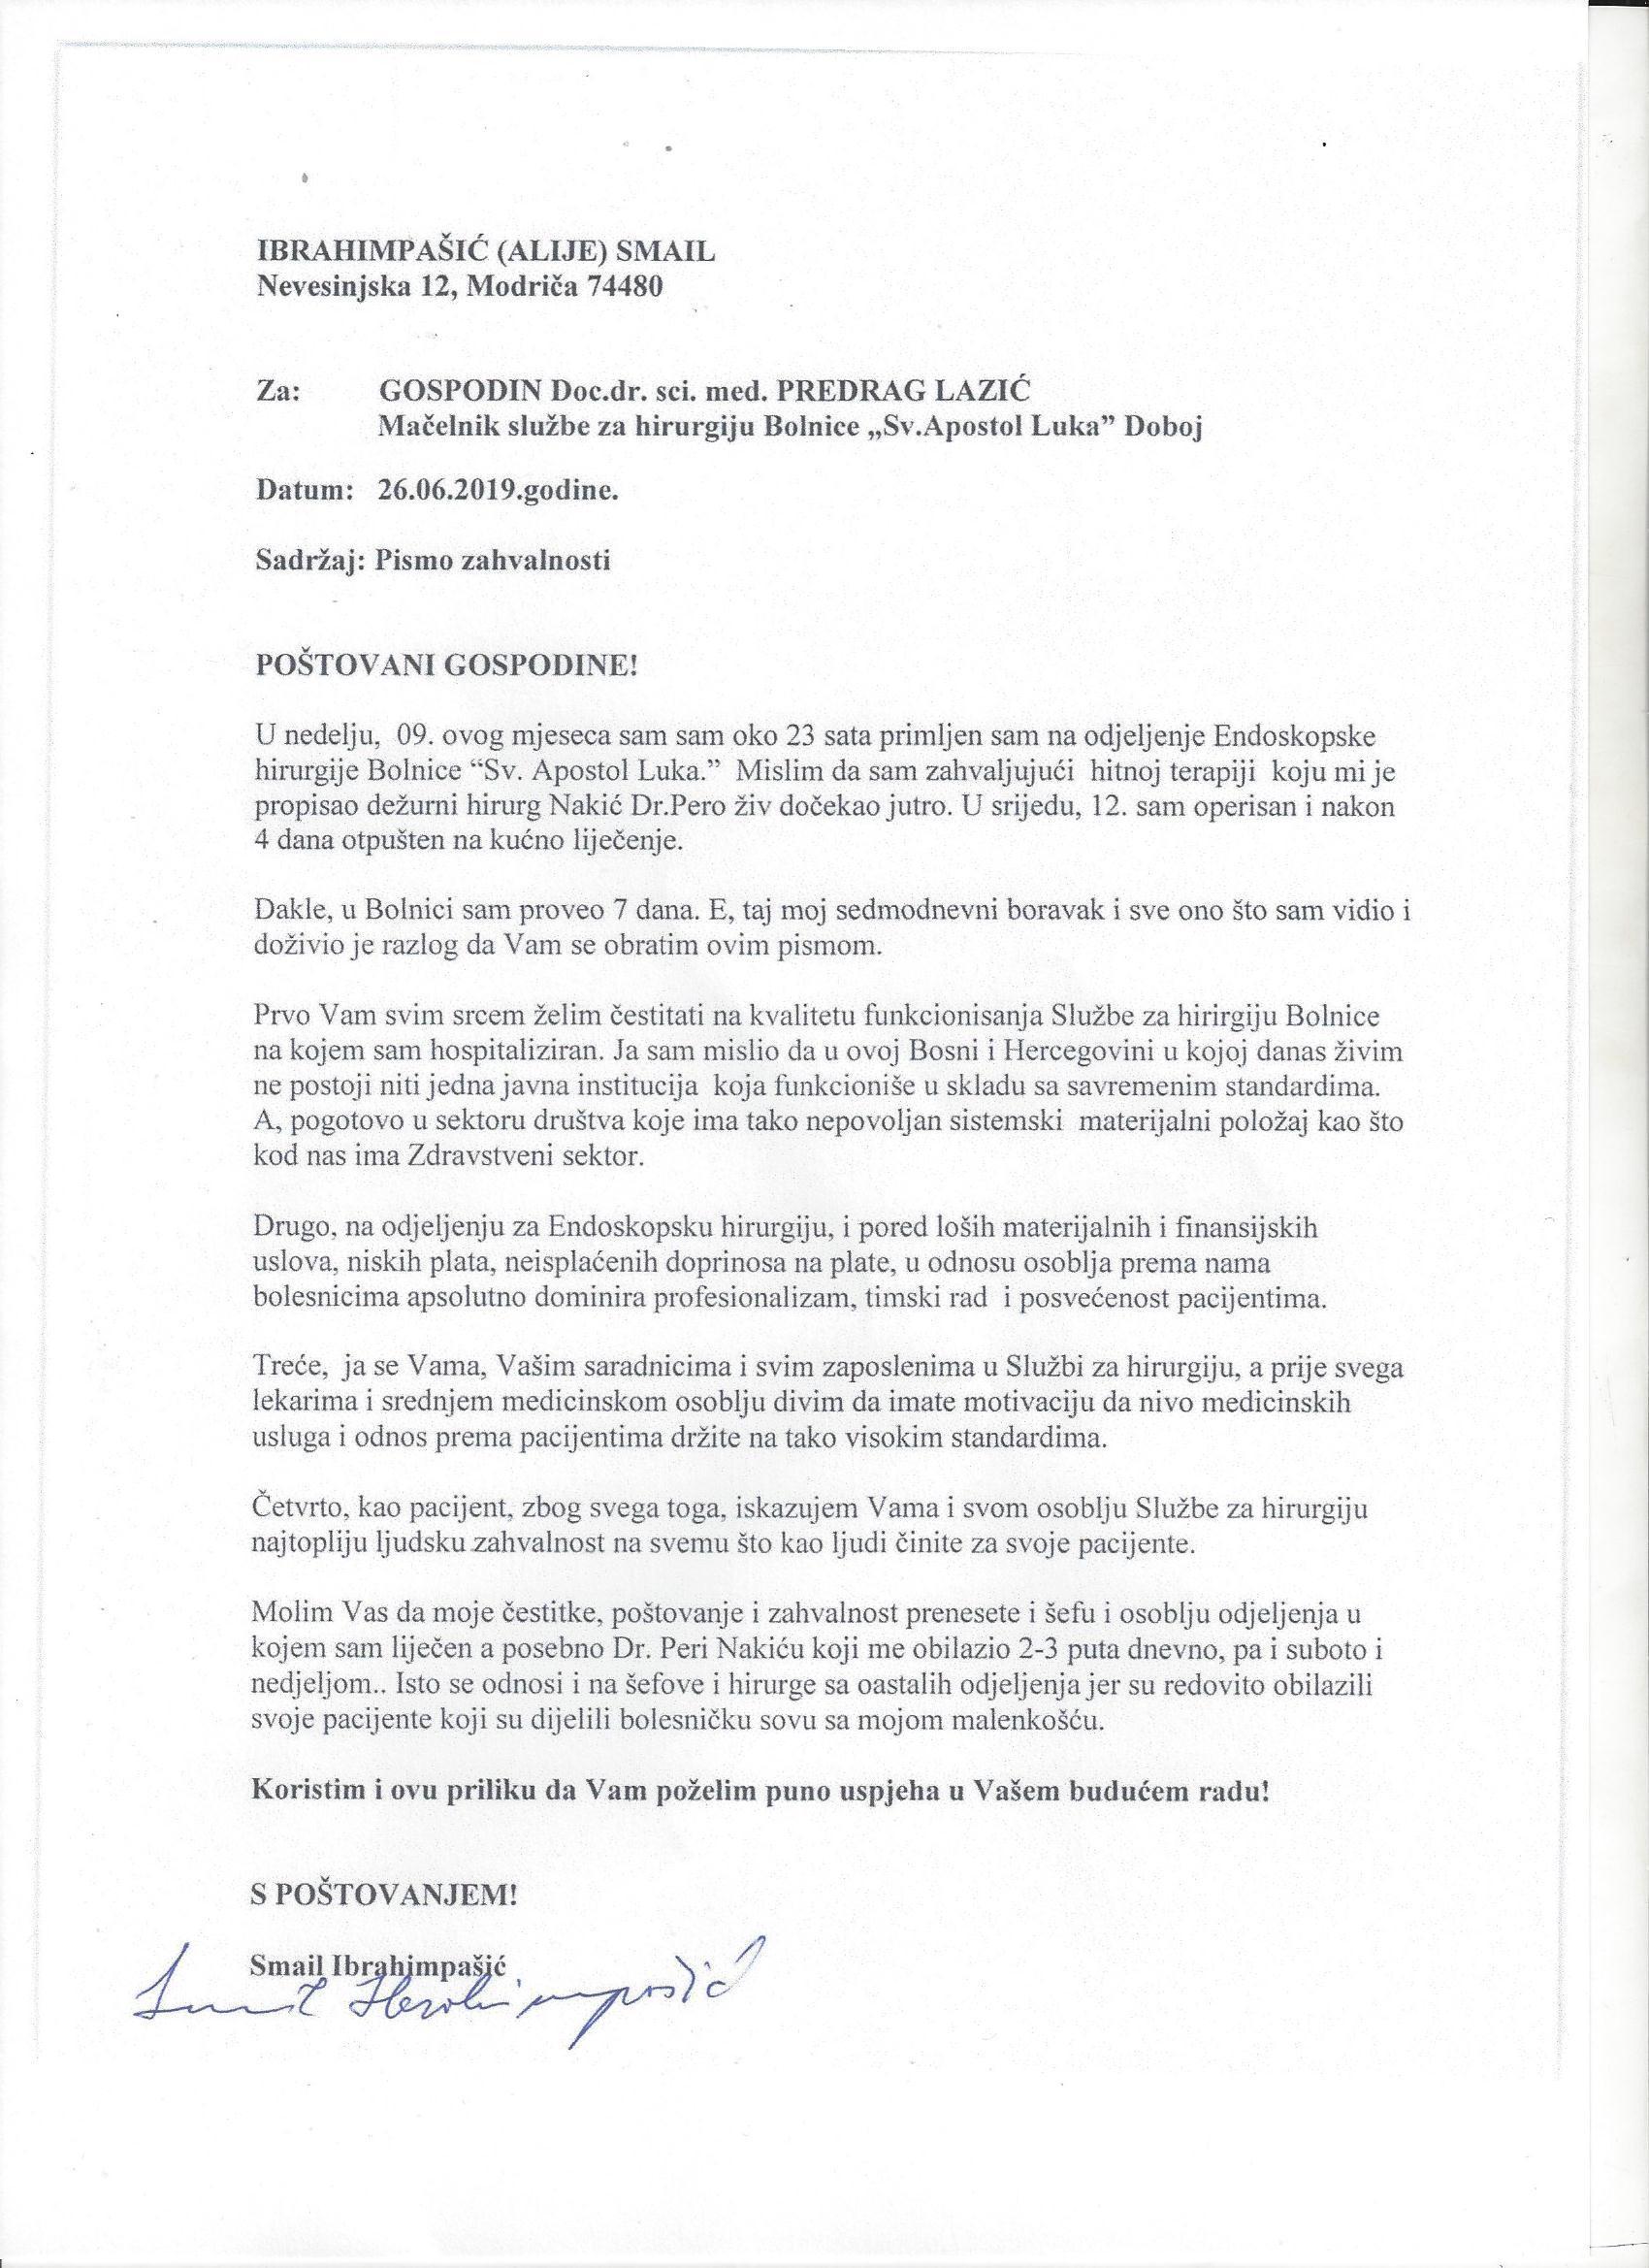 Pismo zahvalnosti dr Predragu Lazicu